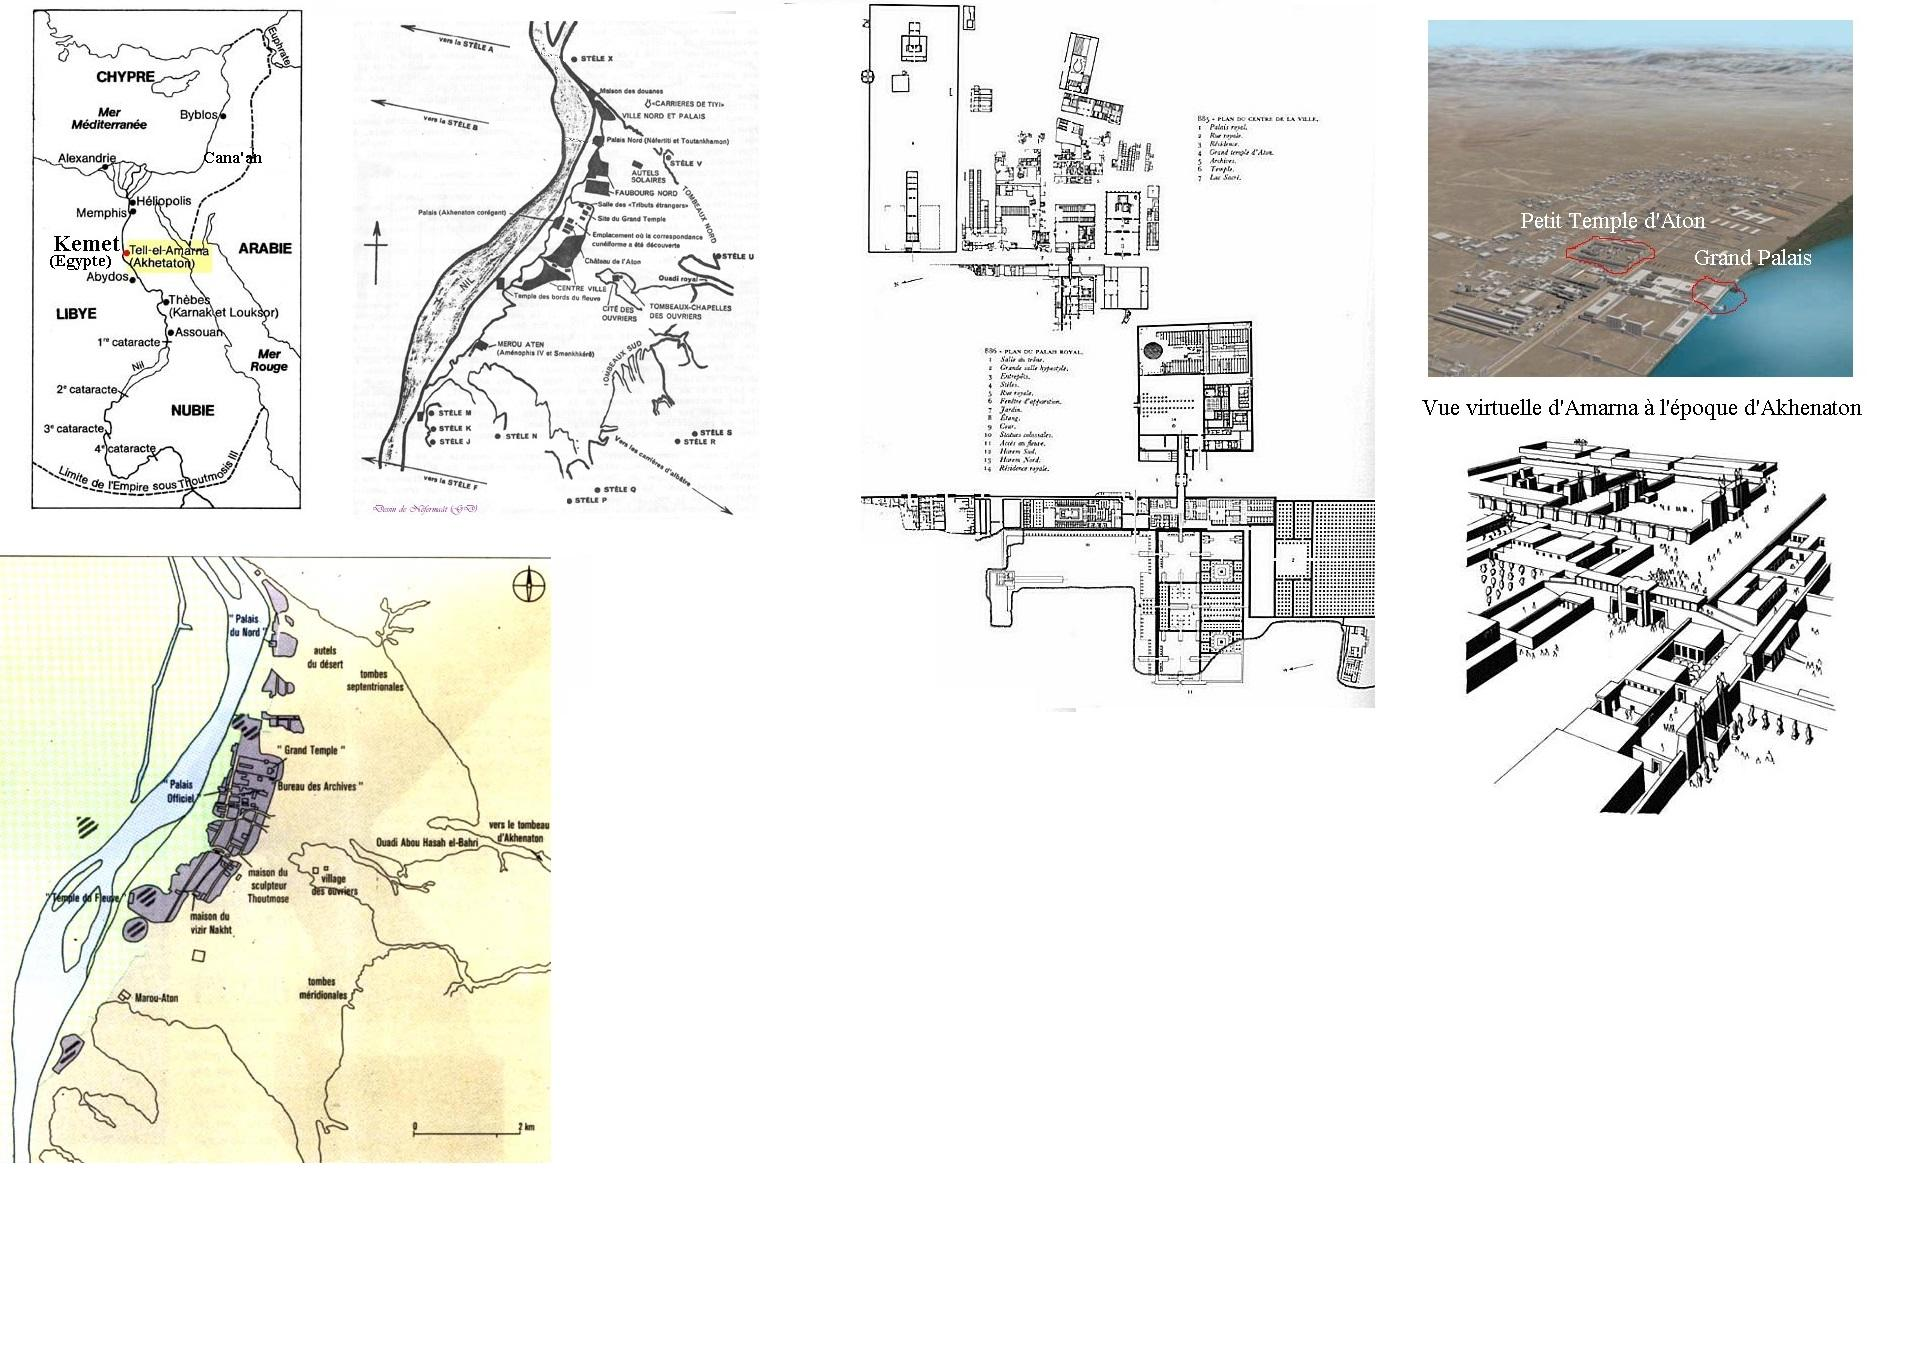 Amarna egypte kemet au temps d akhenaton